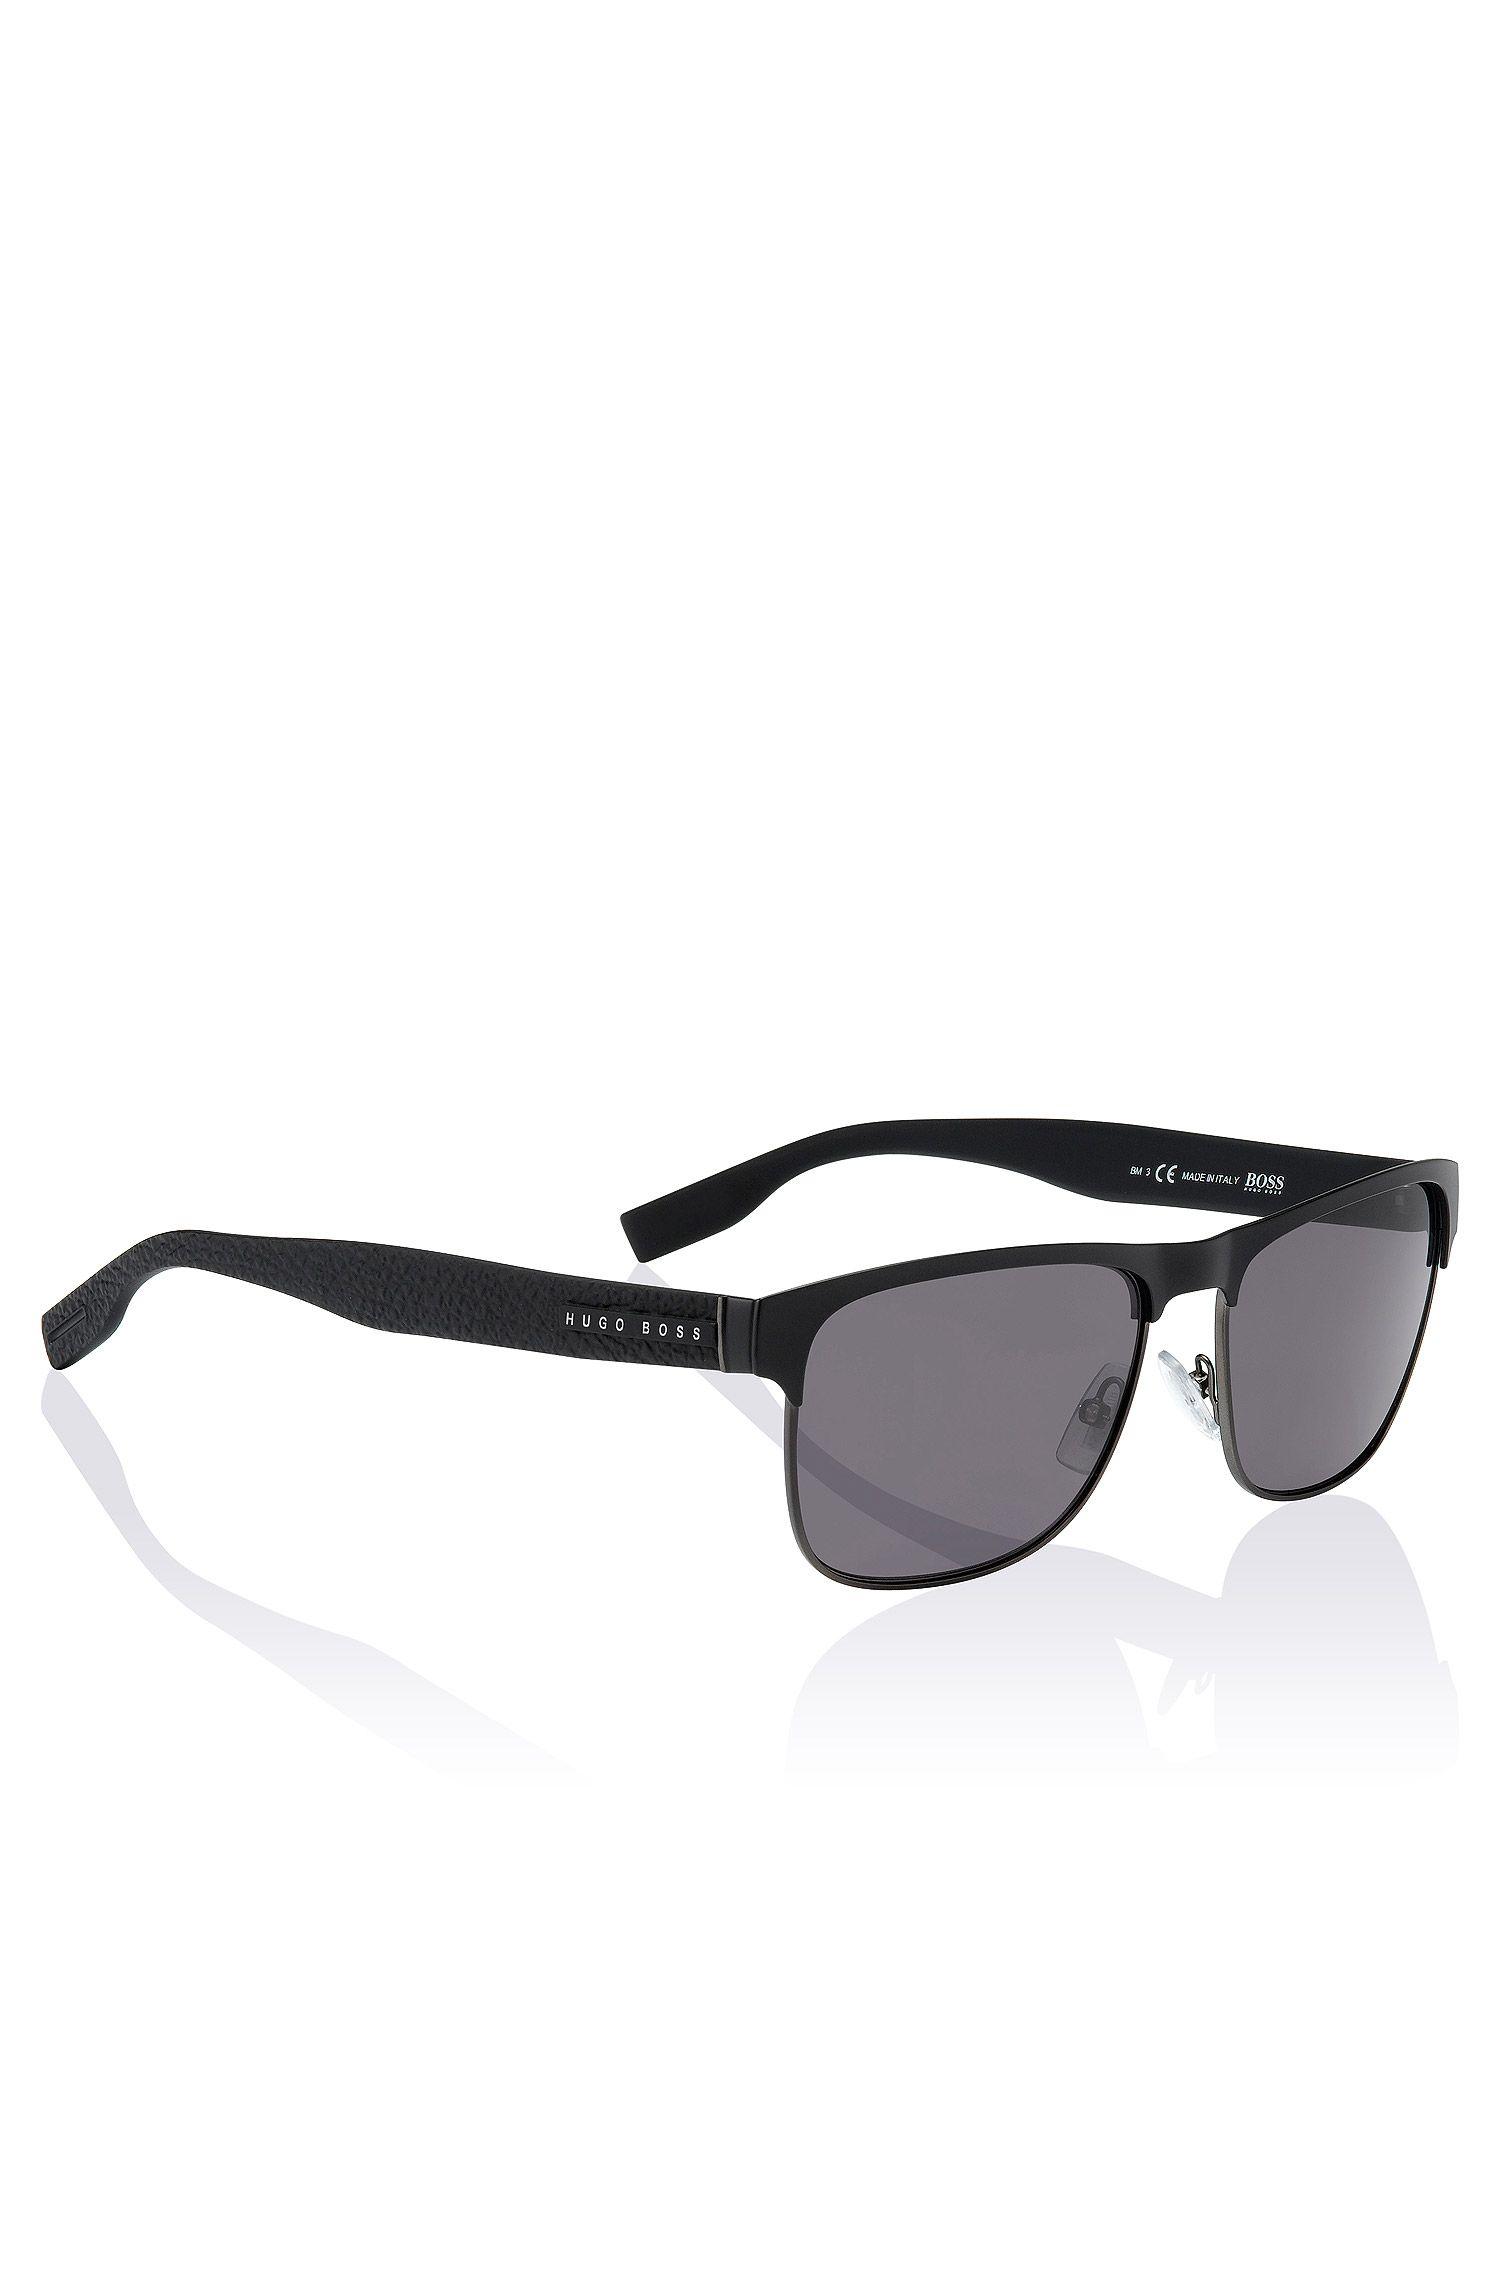 Sonnenbrille ´BOSS 0559/S`